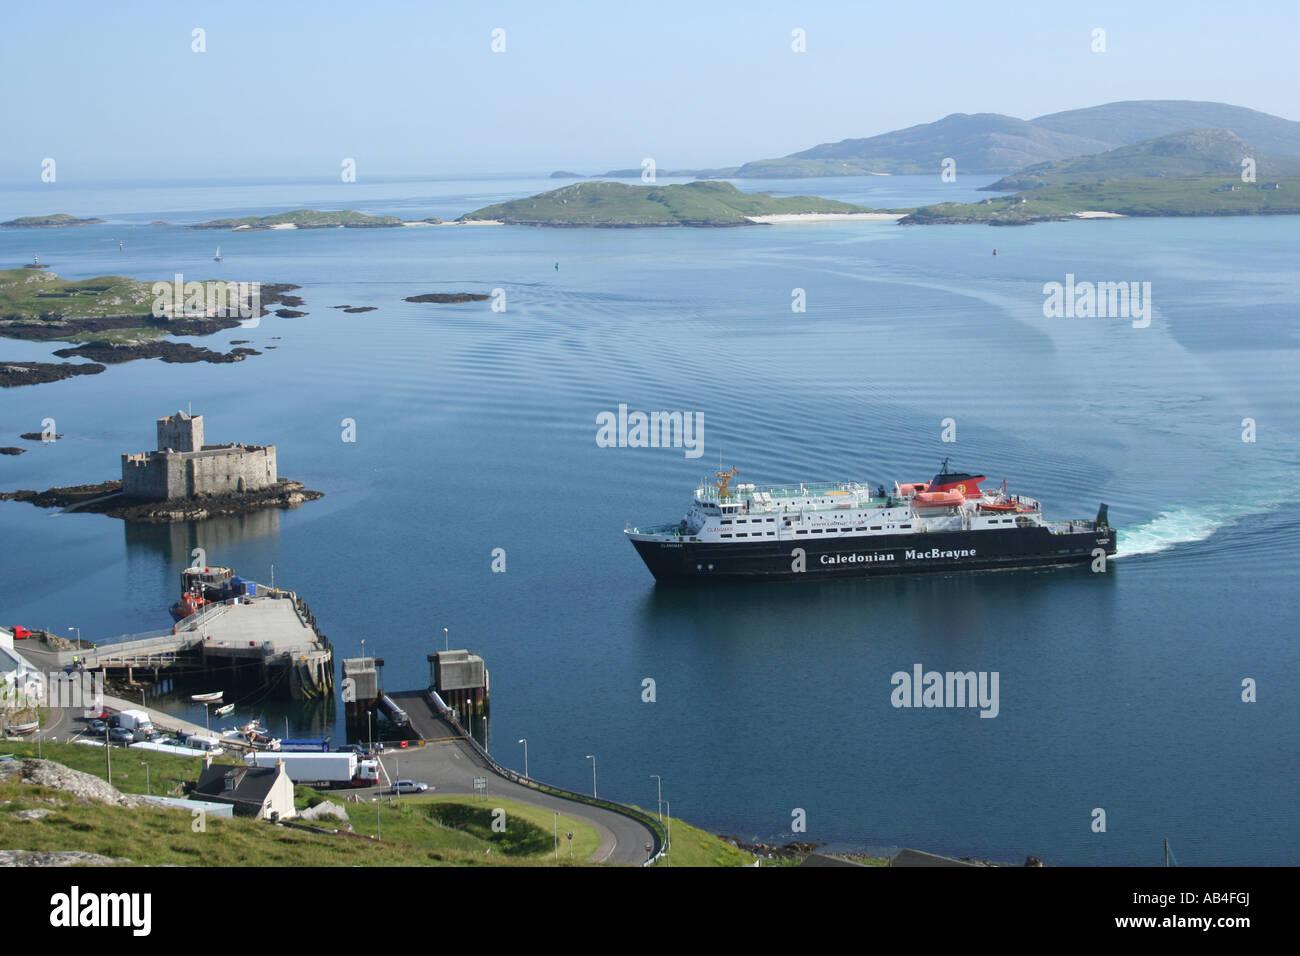 Clansman part of the Caledonian MacBrayne fleet arriving at Castlebay with Kisimul castle isle of Barra Scotland - Stock Image